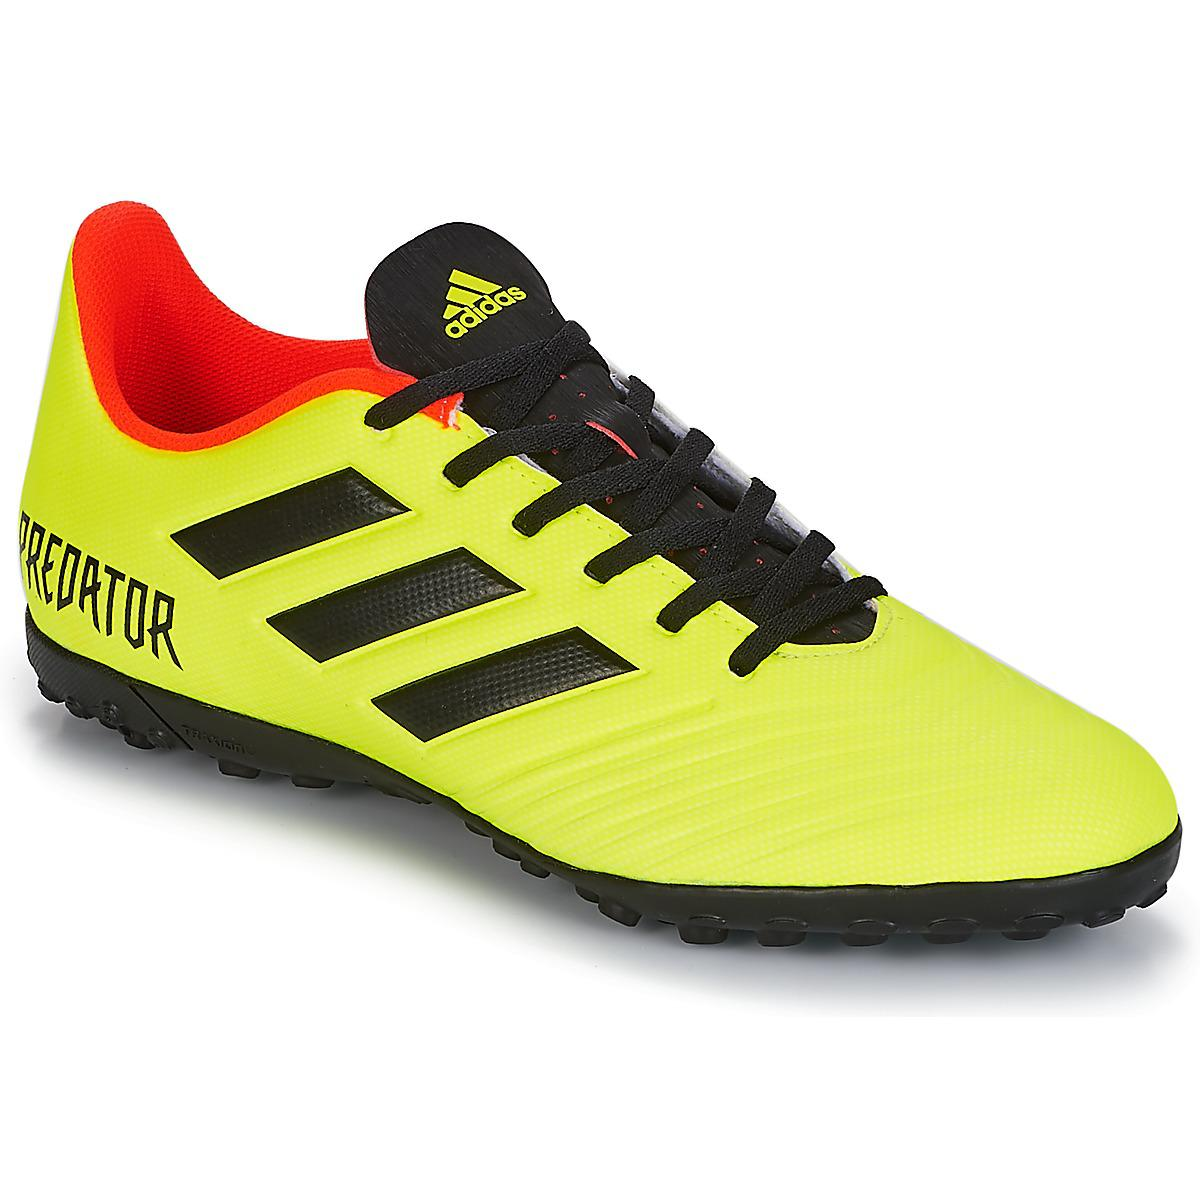 the best attitude 88106 8a7d3 adidas. Mens Yellow Predator Tango 18.4 Tf Football Boots